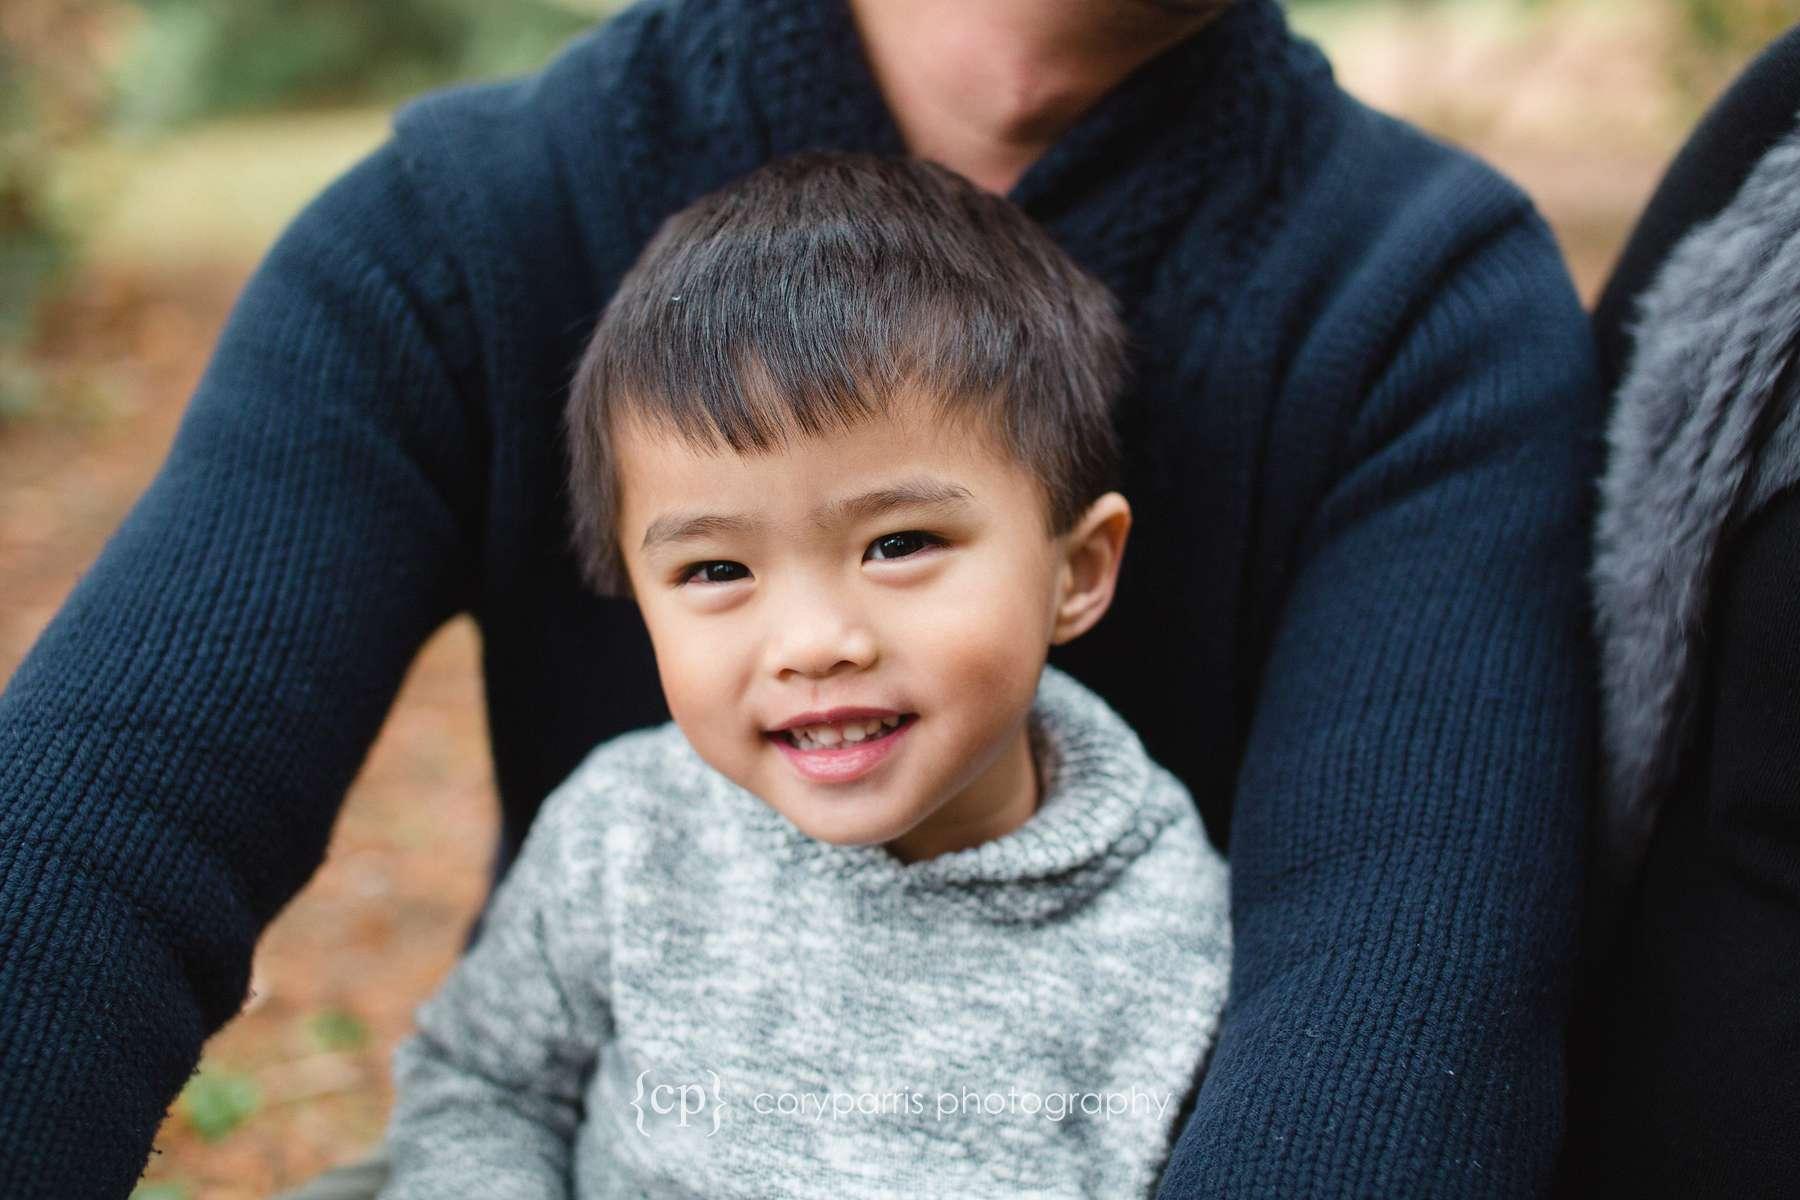 Family and child portraits at Washington Park Arboretum